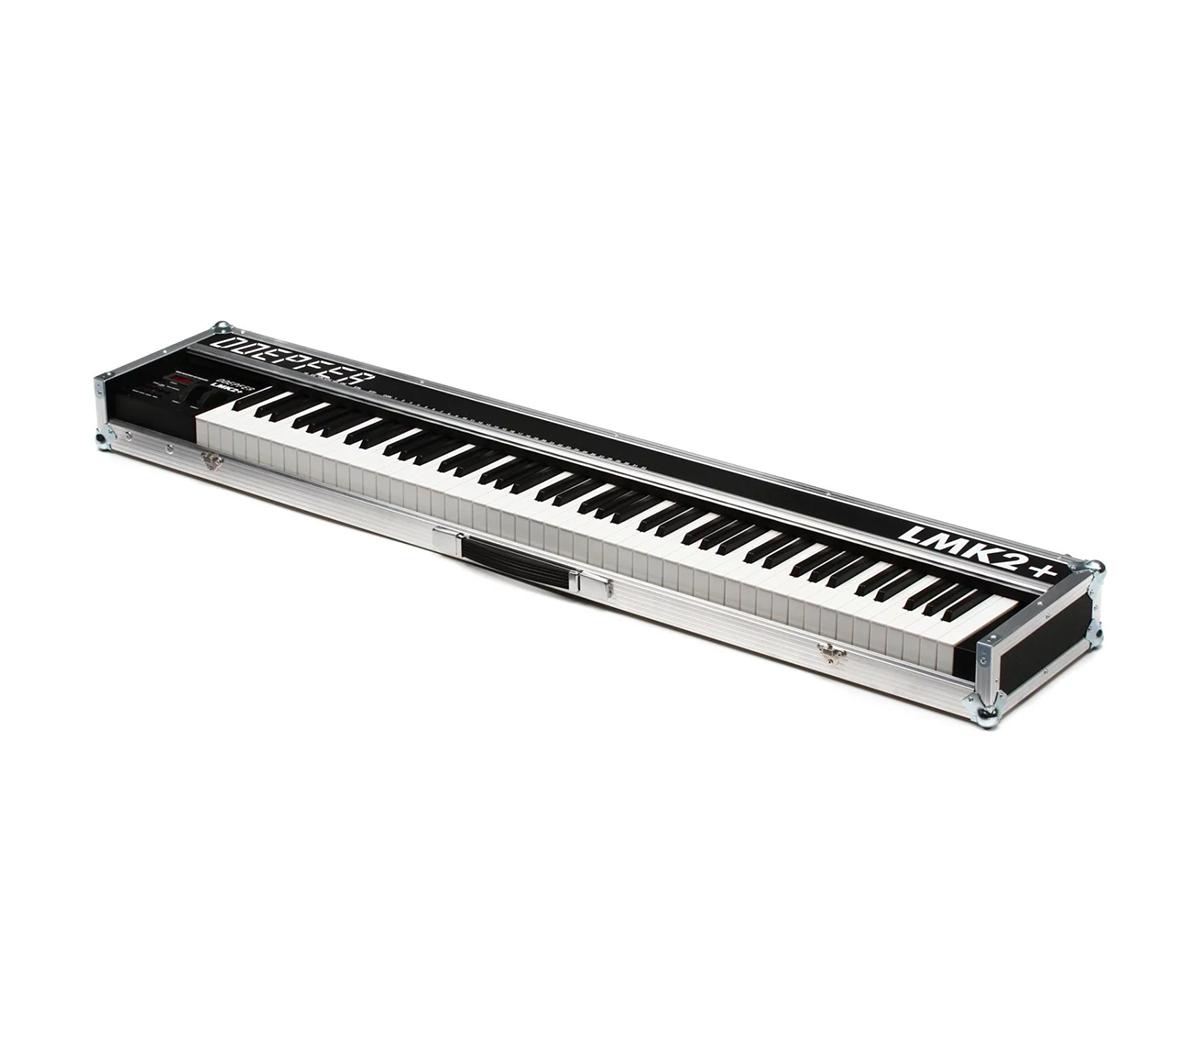 TECLADO CONTROLADOR MIDI USB DOEPFER LMK2+